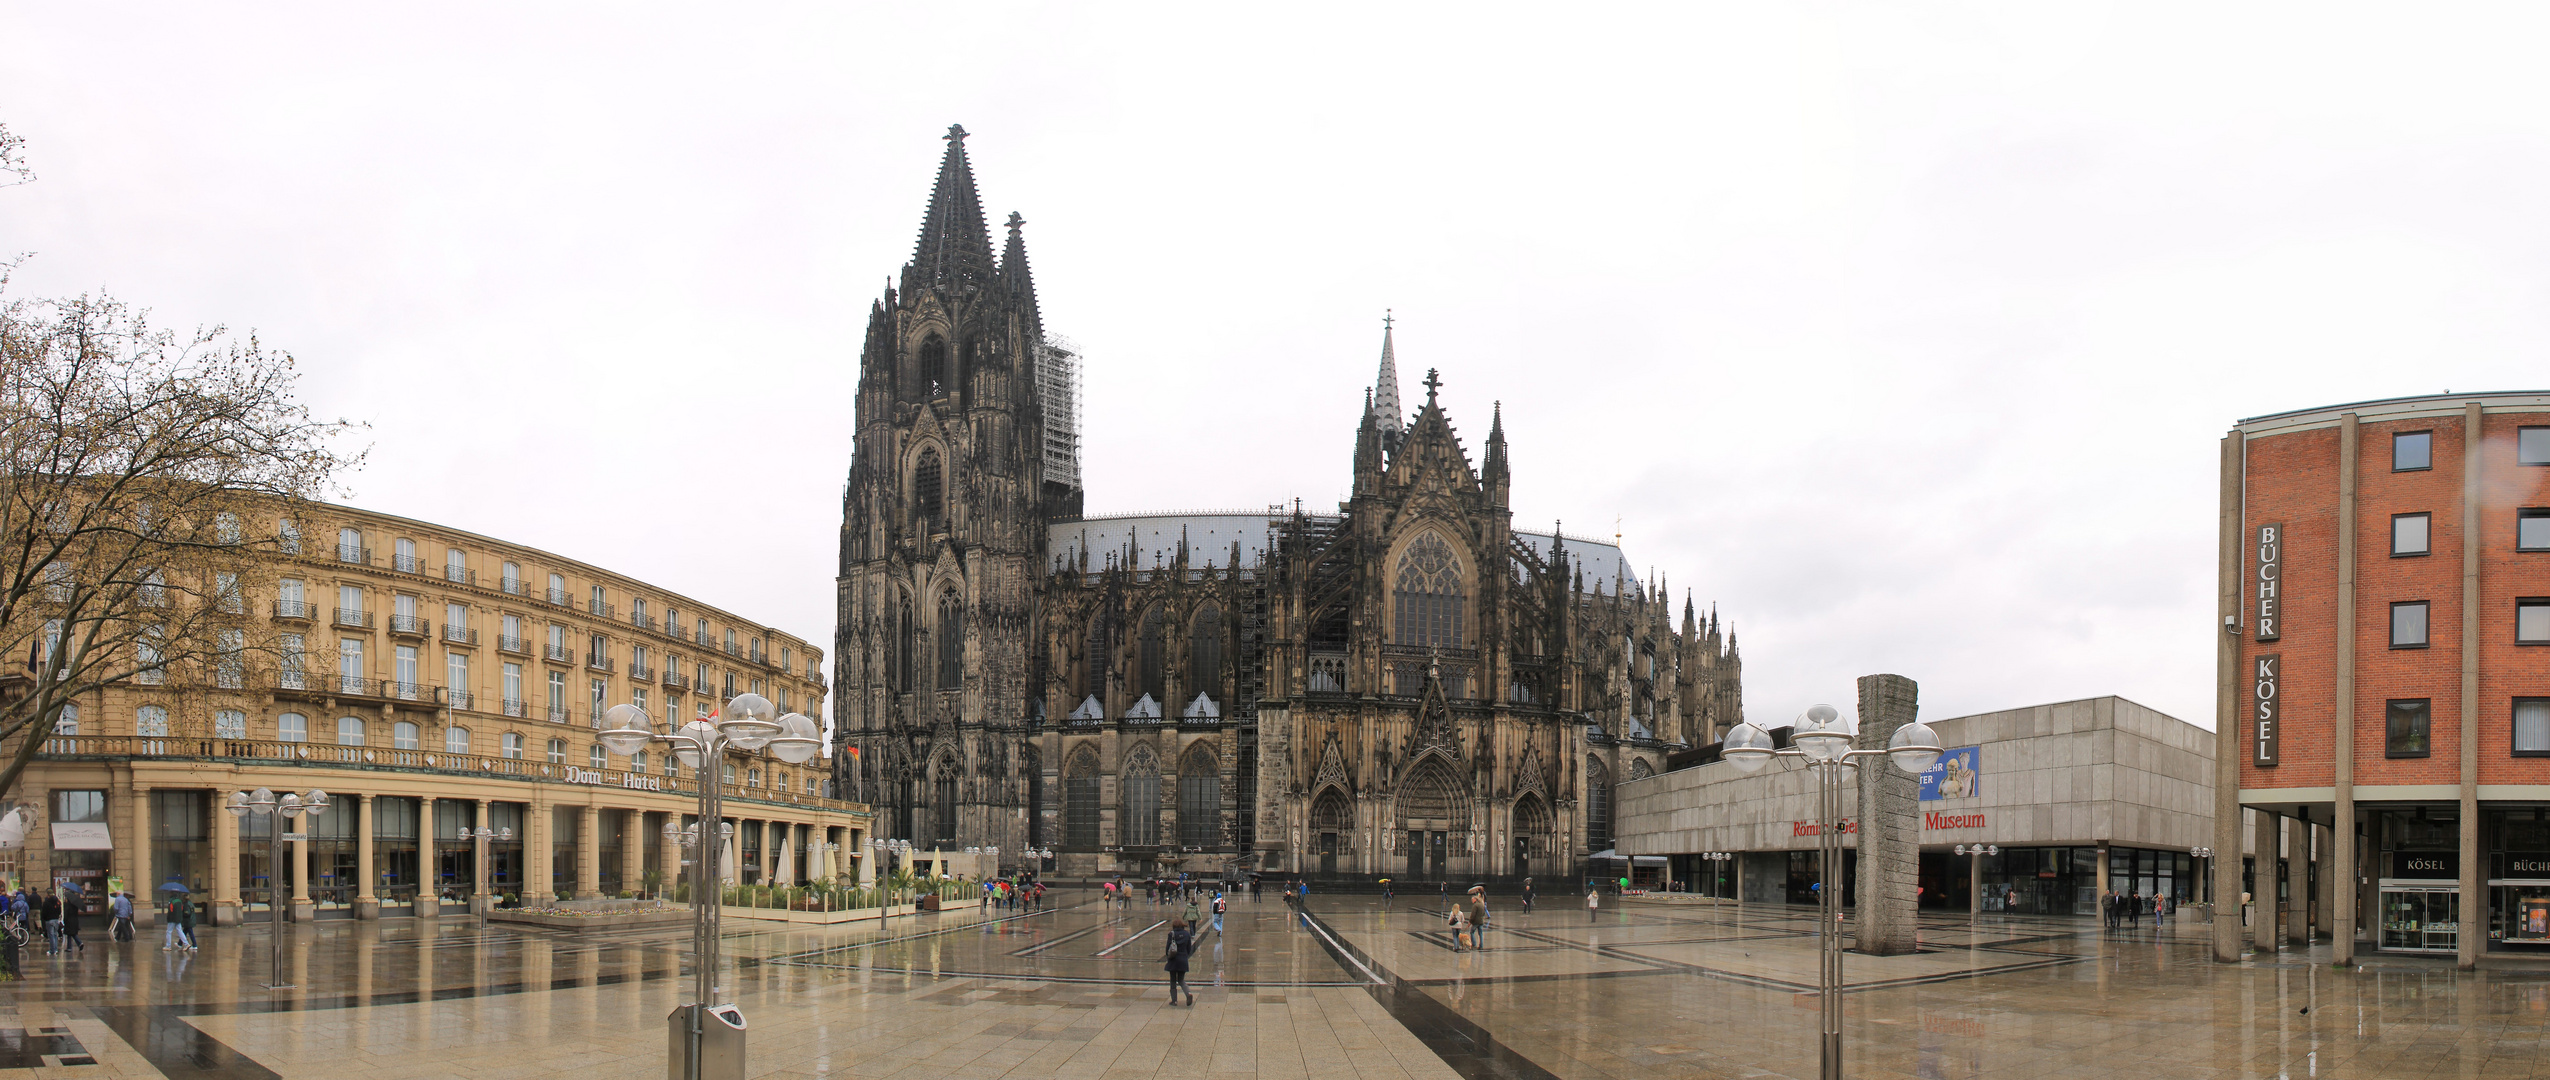 Kölner Dom im Regen am 09-04-2012